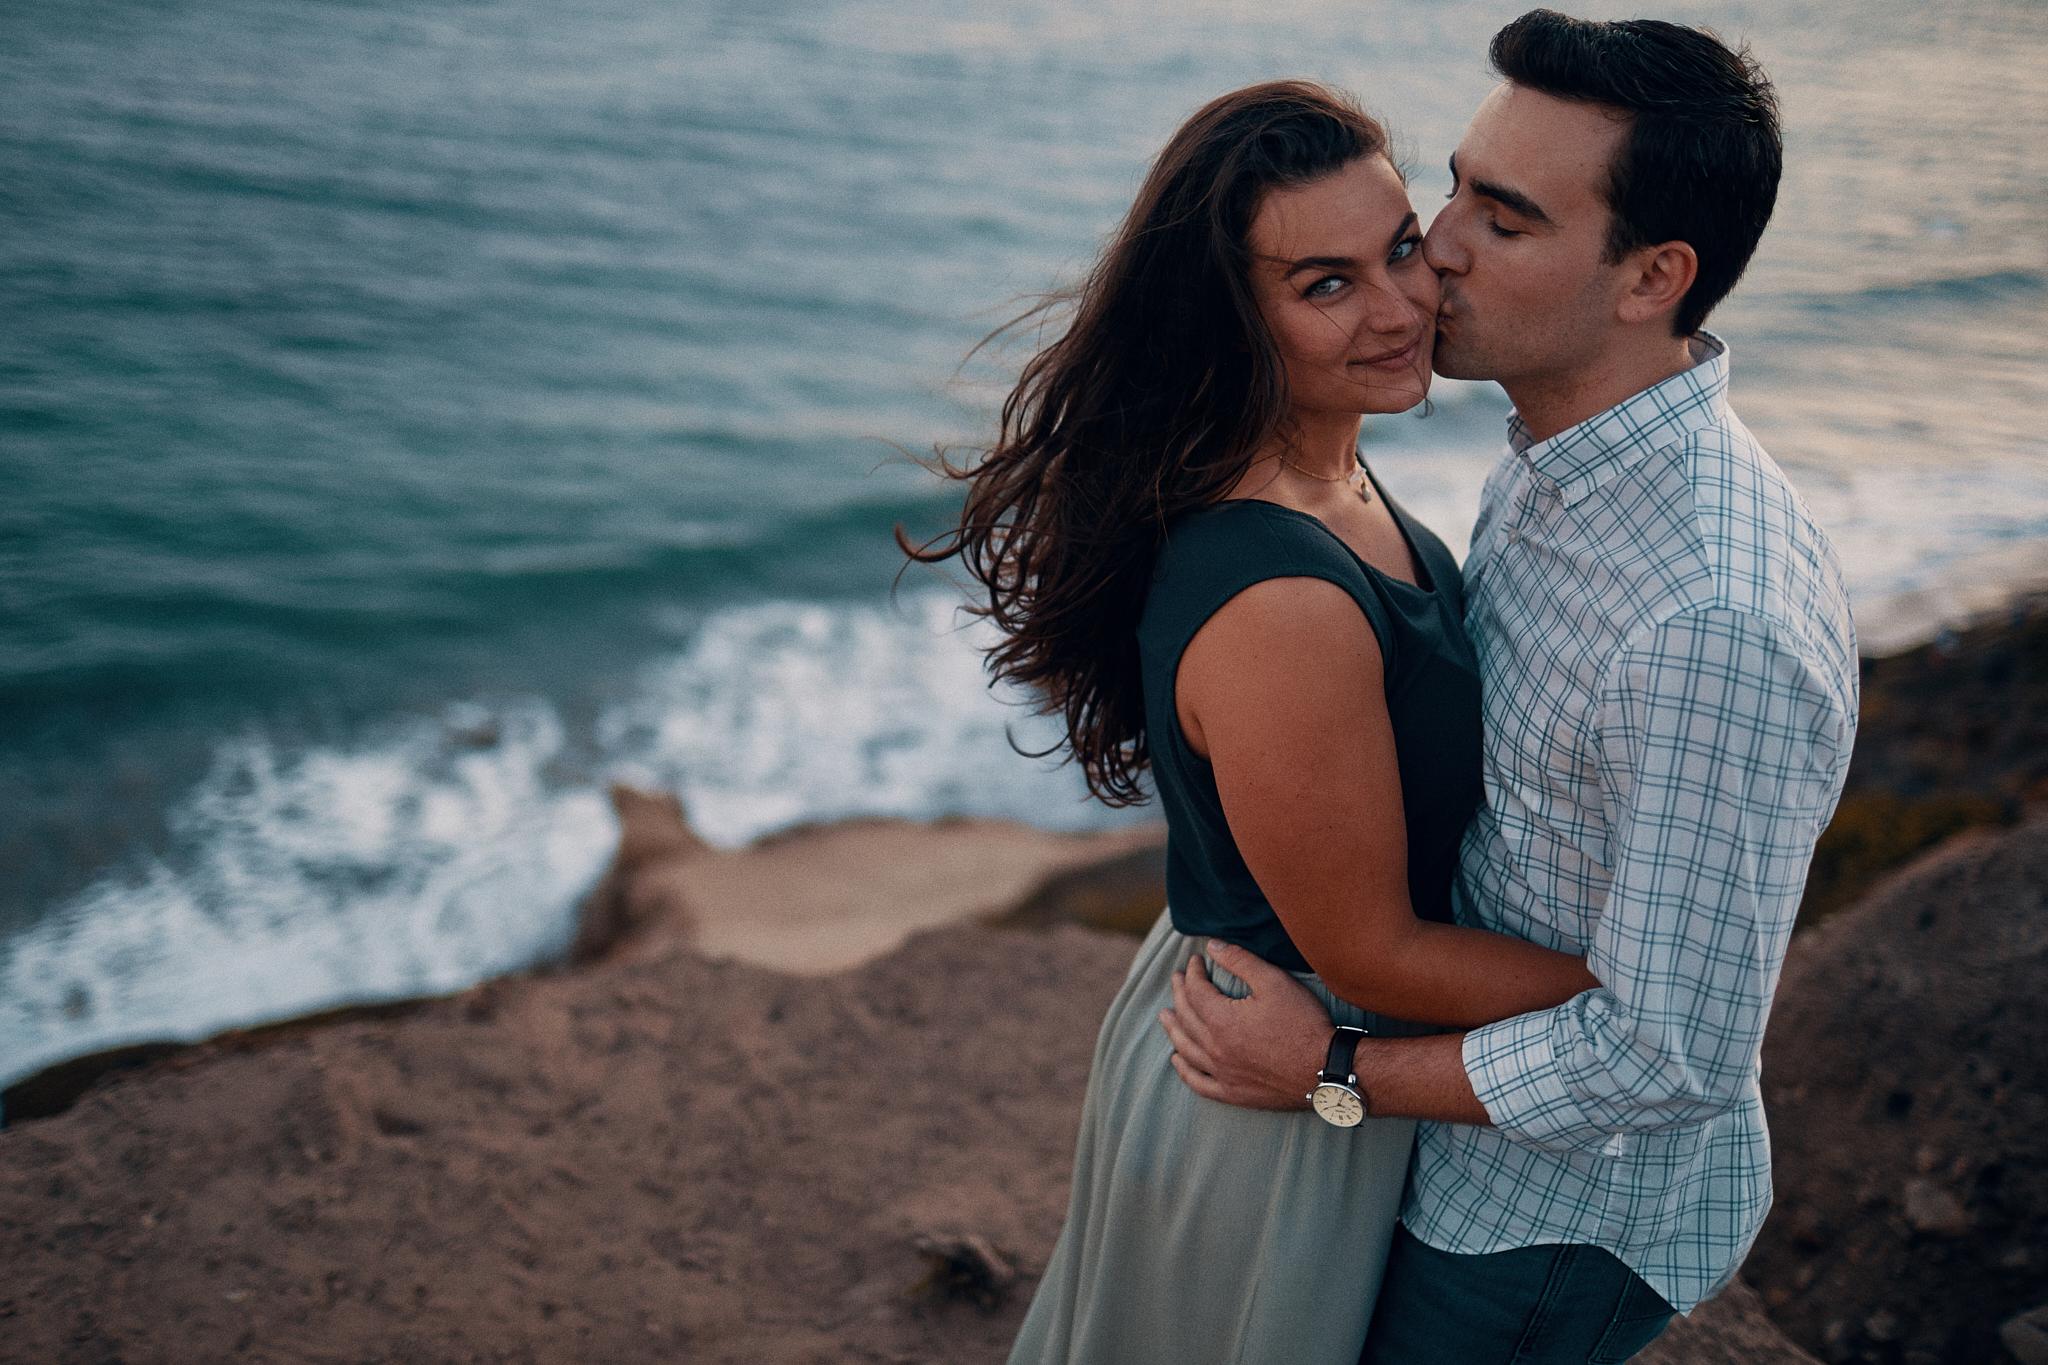 Engagement_Photographer_Twin_Cities_St_Paul_Miinneapolis_Lifestyle_Outdoor_Somethin_Candi_Photography_001.JPG